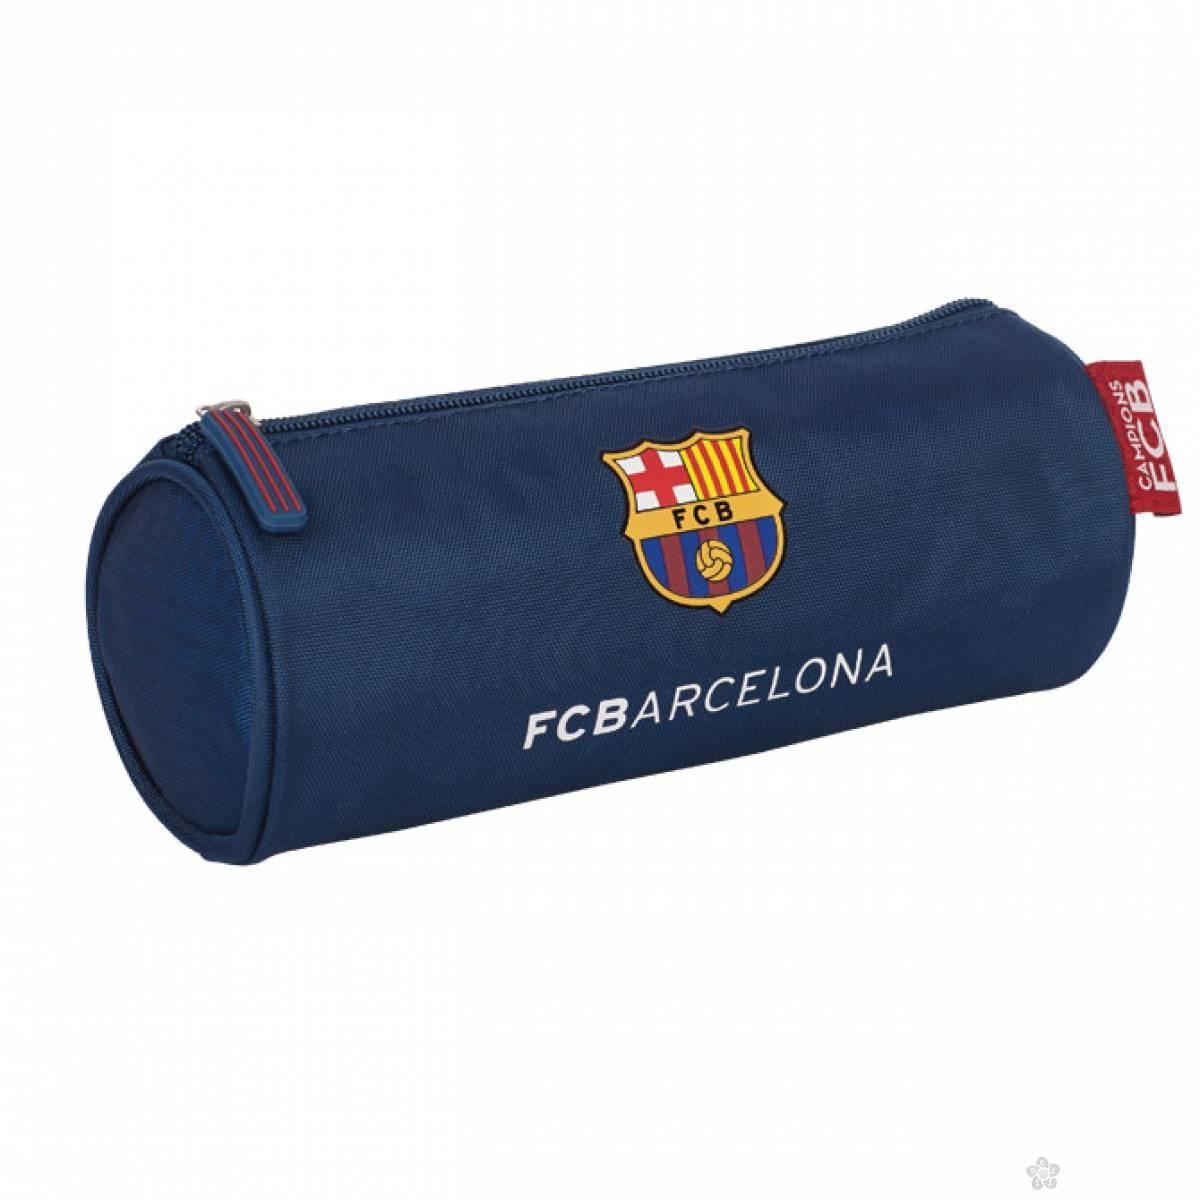 Okrugla pernica FC Barcelona 1 zip FC-154 Astra